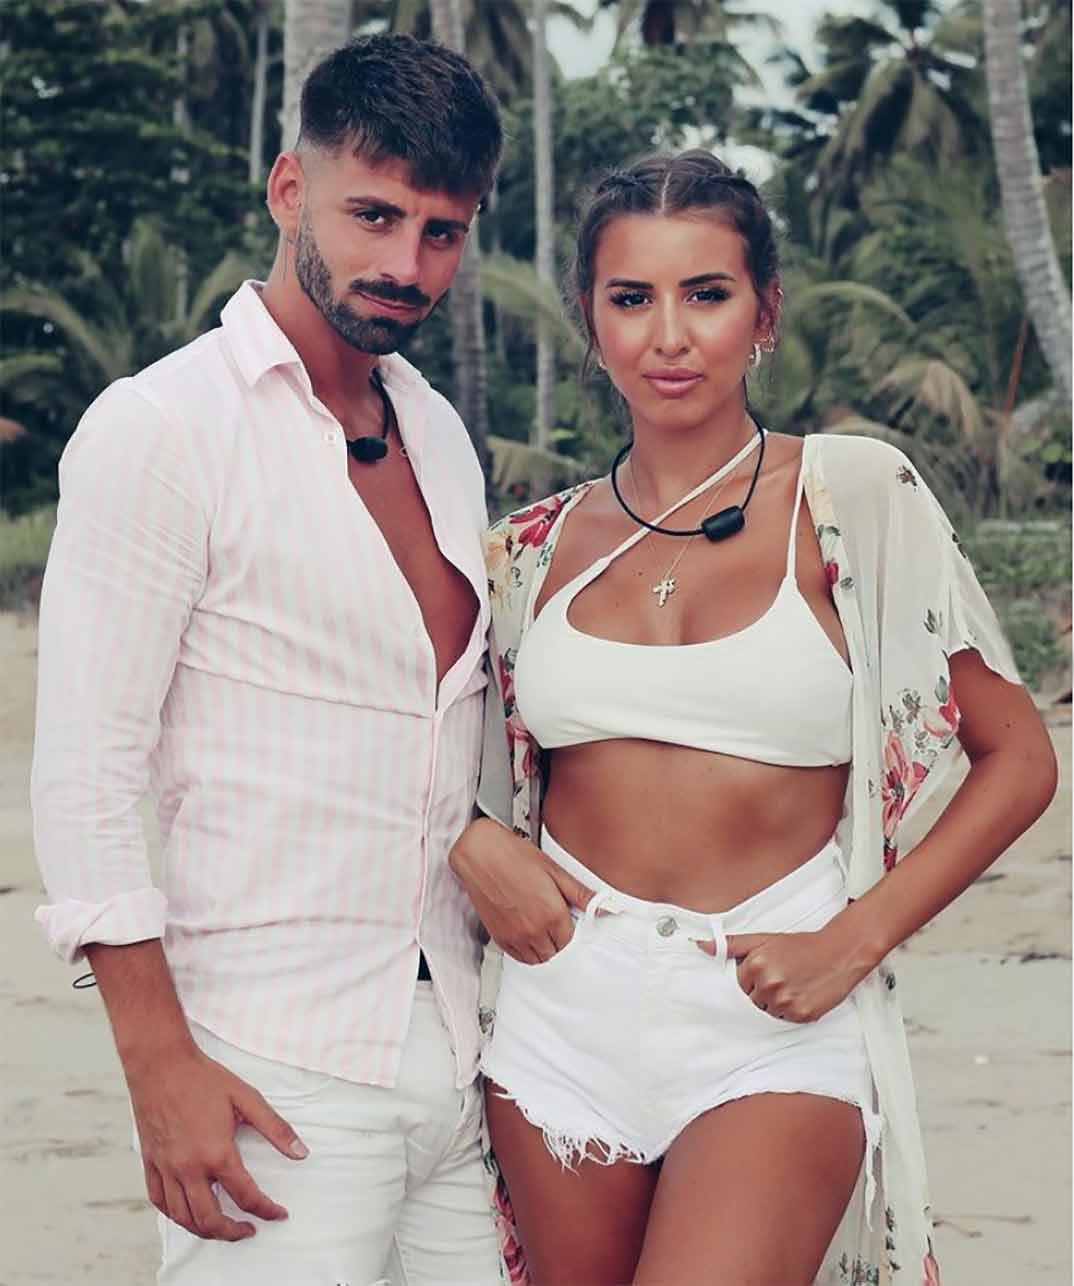 Marina e Isaac - La isla de las tentaciones 3 © Telecinco